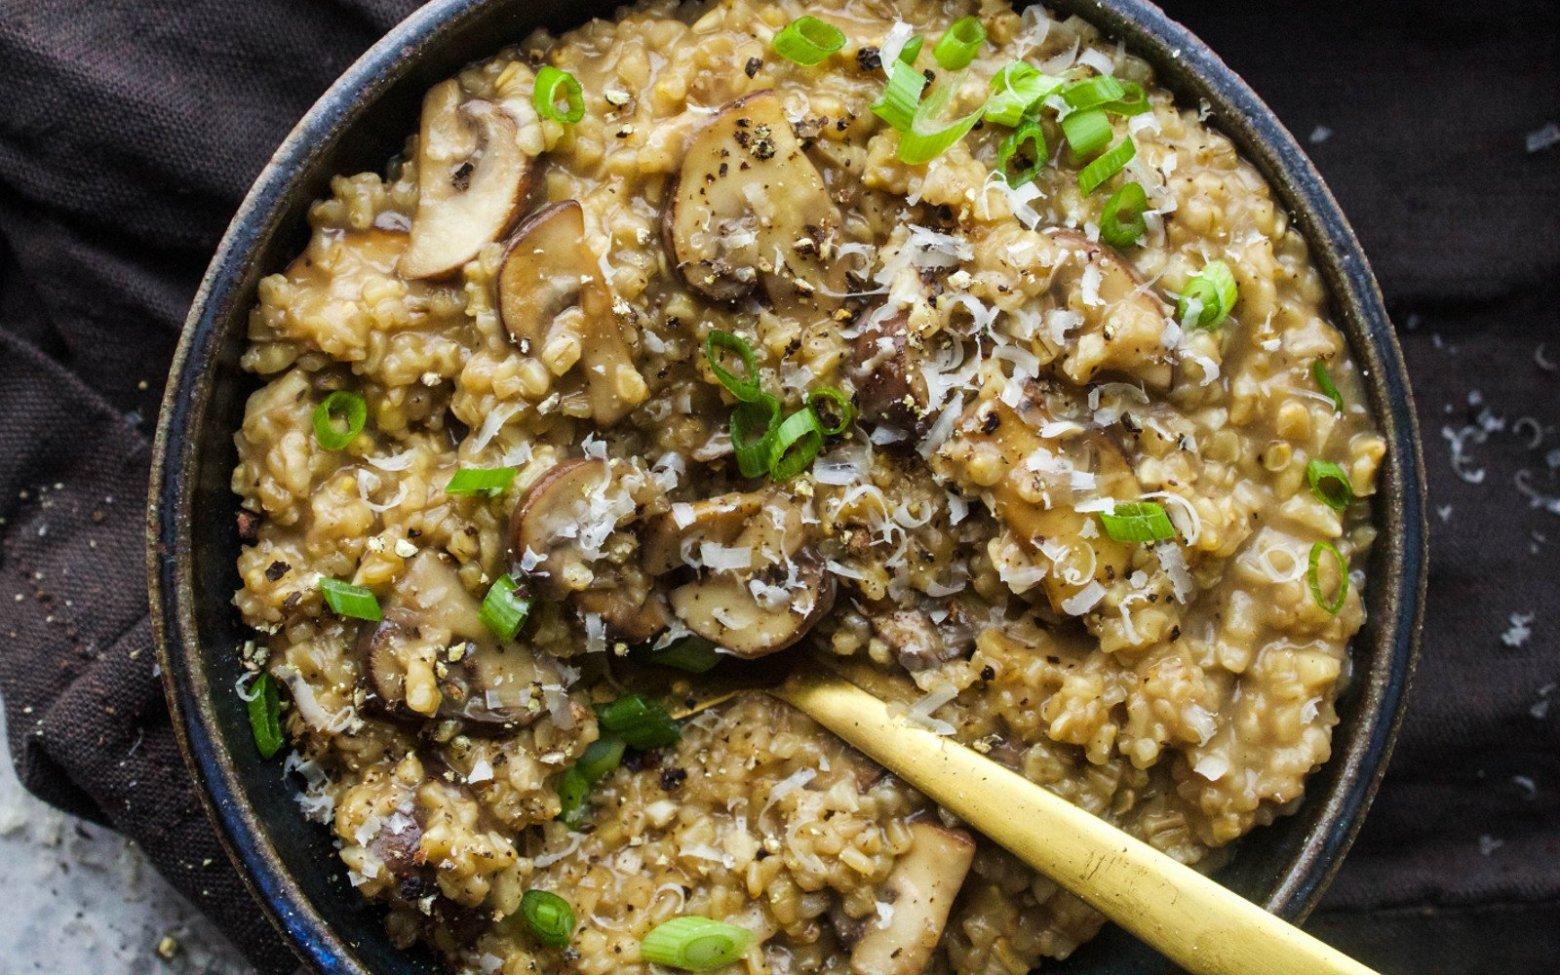 Savory Mushroom Oats [Vegan, Gluten-Free]